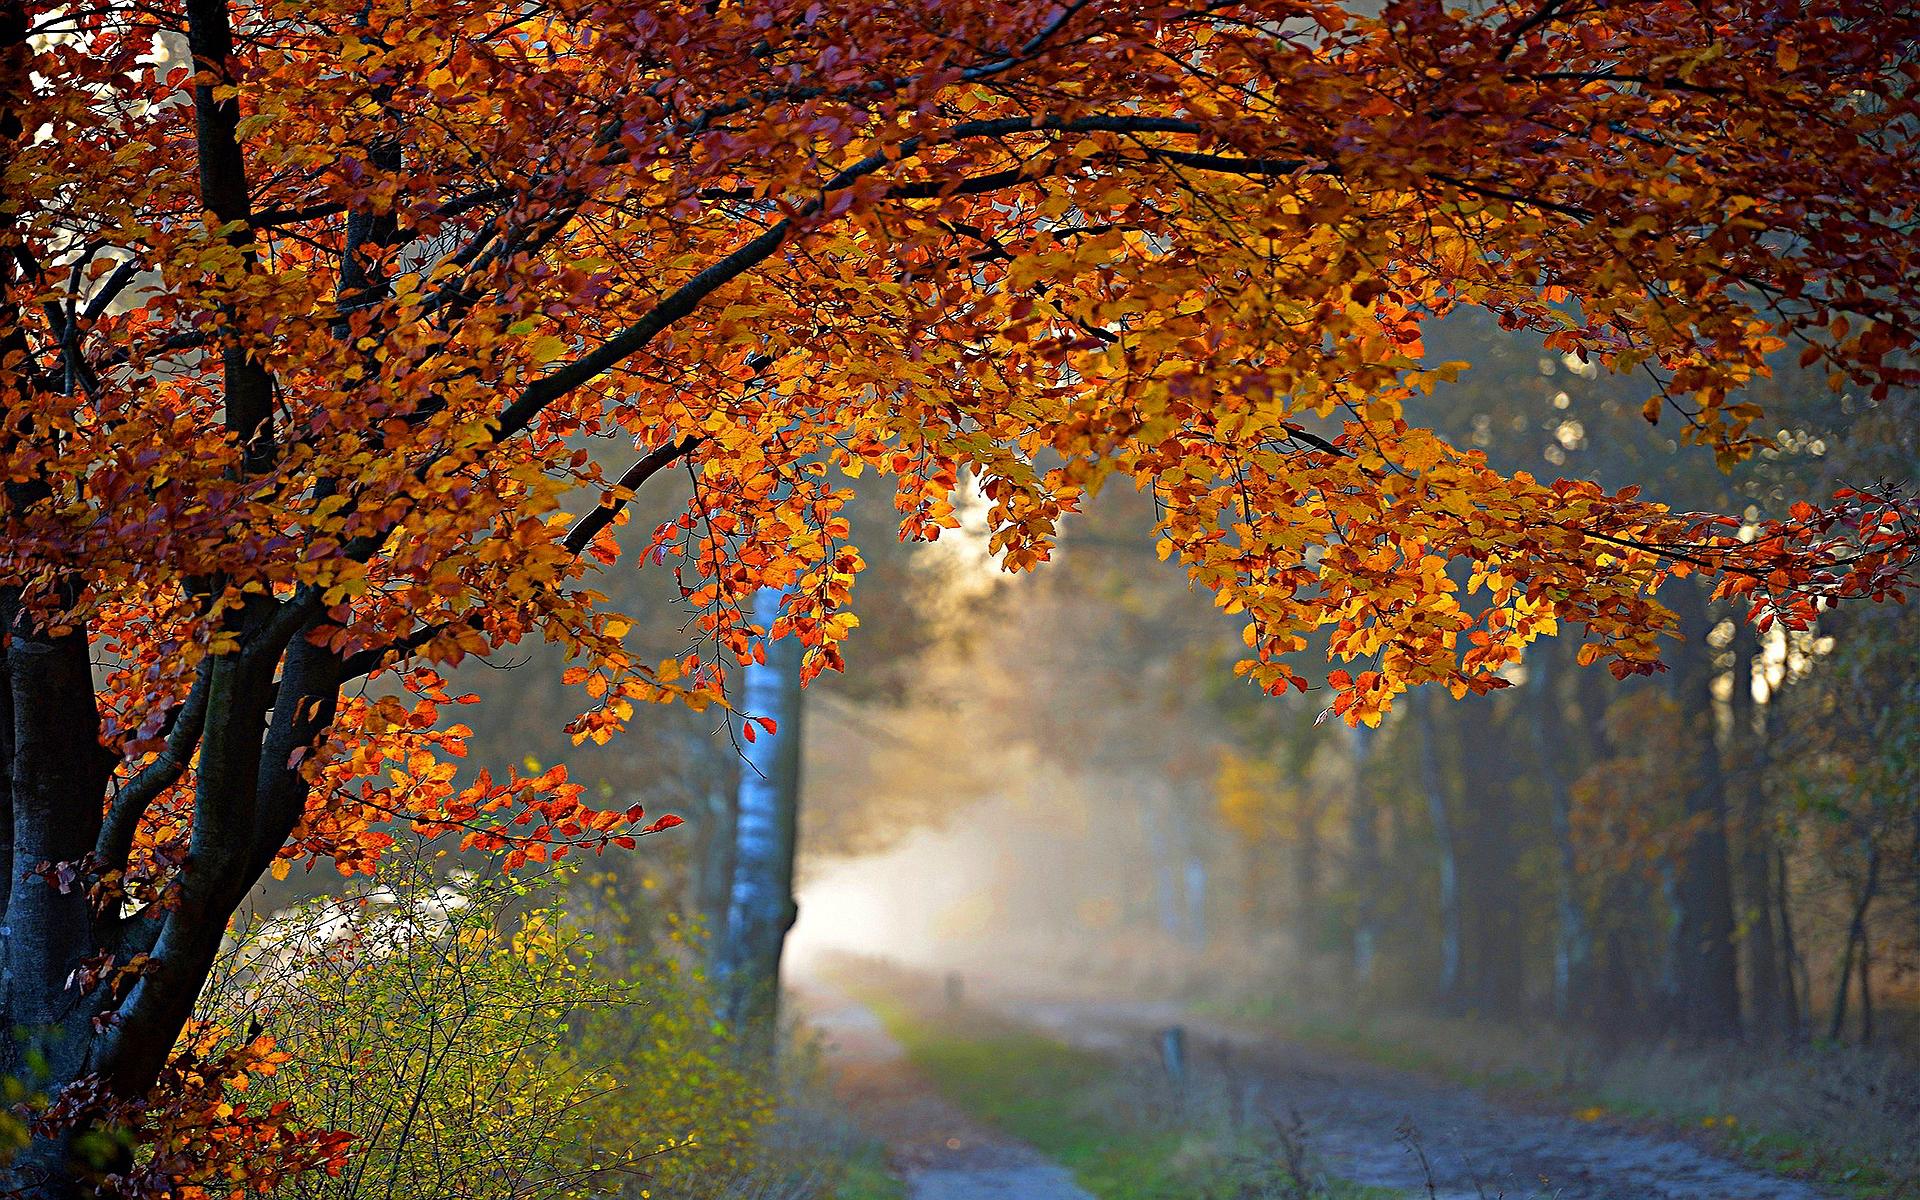 Maine Fall Foliage Wallpaper Autumn Foliage Road Hd Desktop Wallpapers 4k Hd